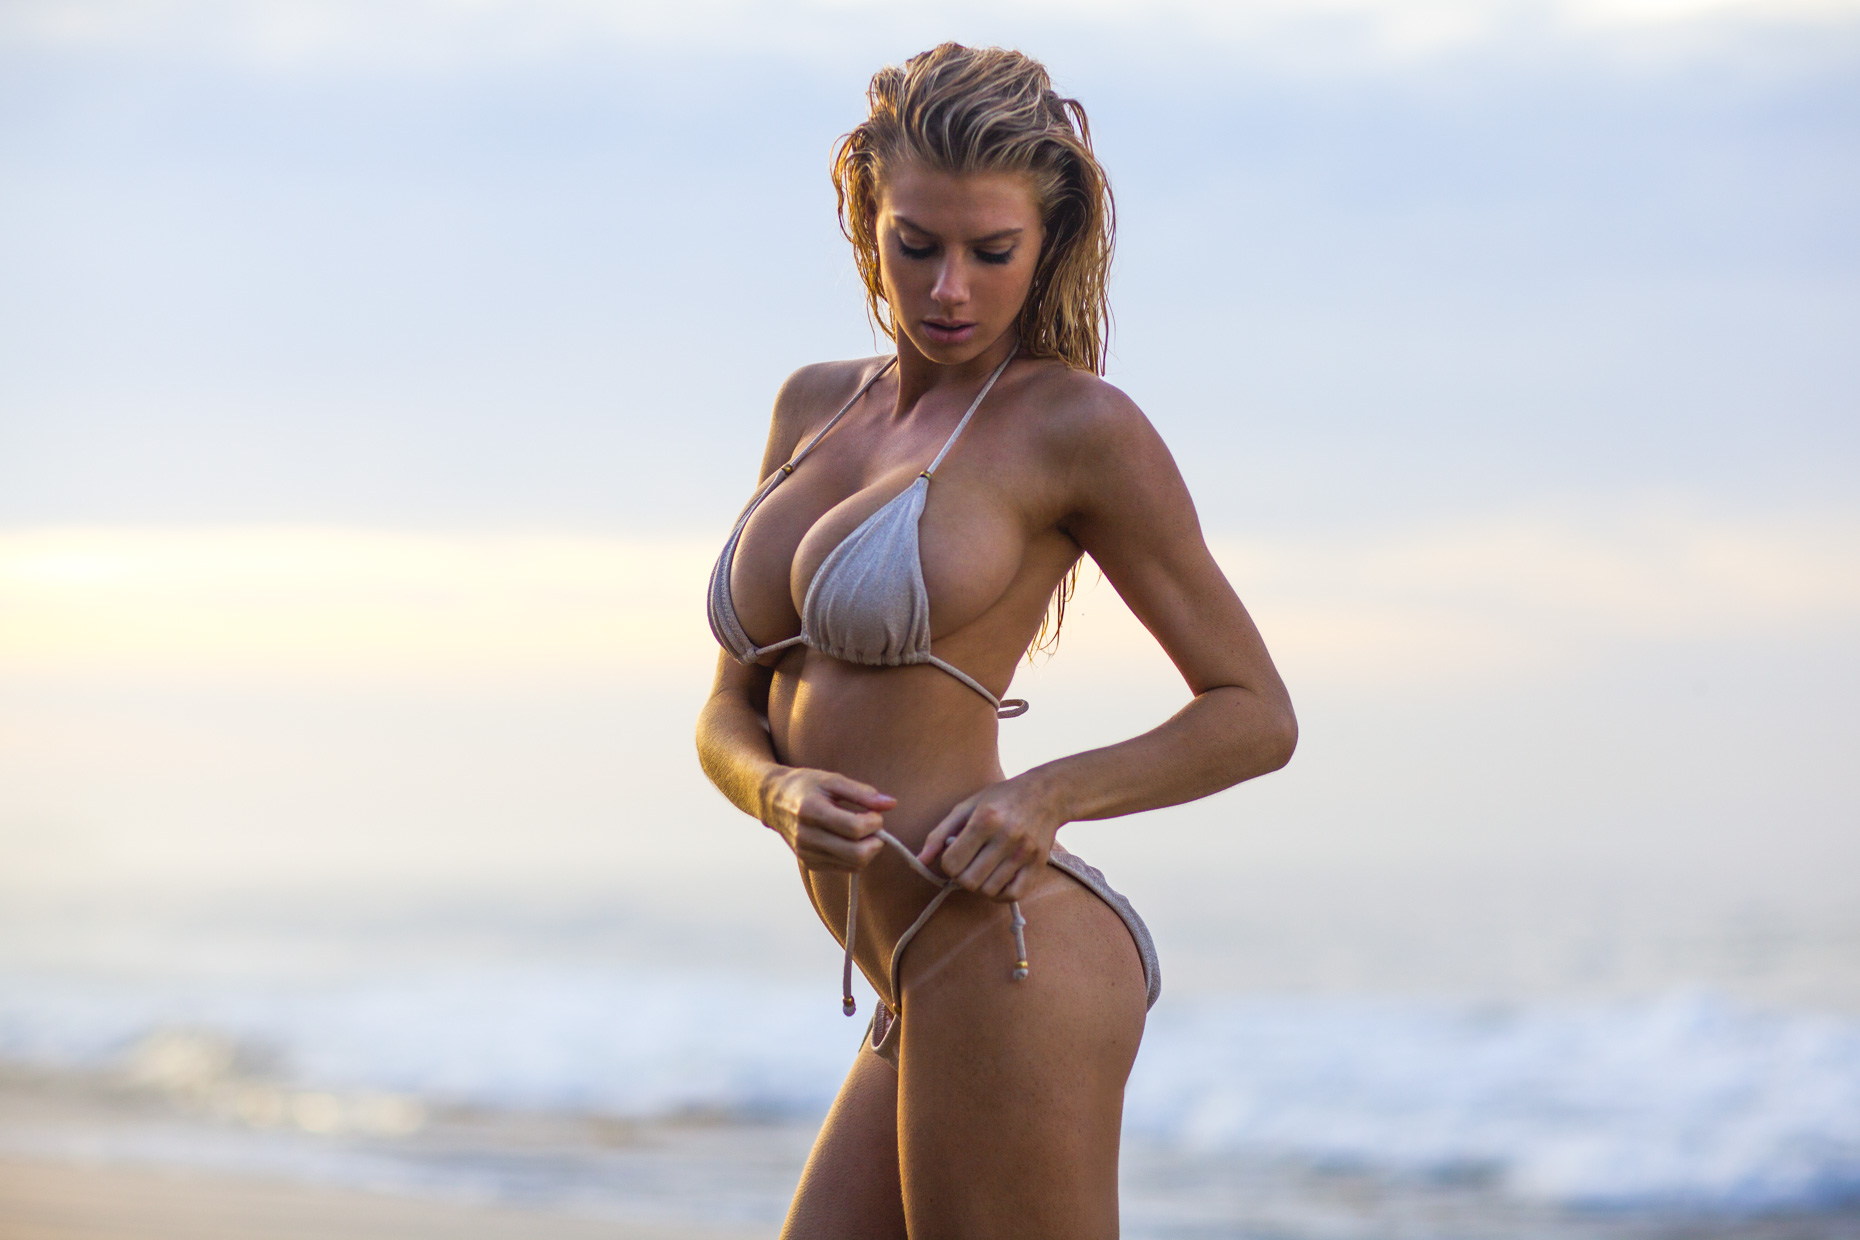 b32956fe4fac0 charlotte-mckinney-wet-tshirt-nipples-tyler-kandel-photoshoot-1 ...